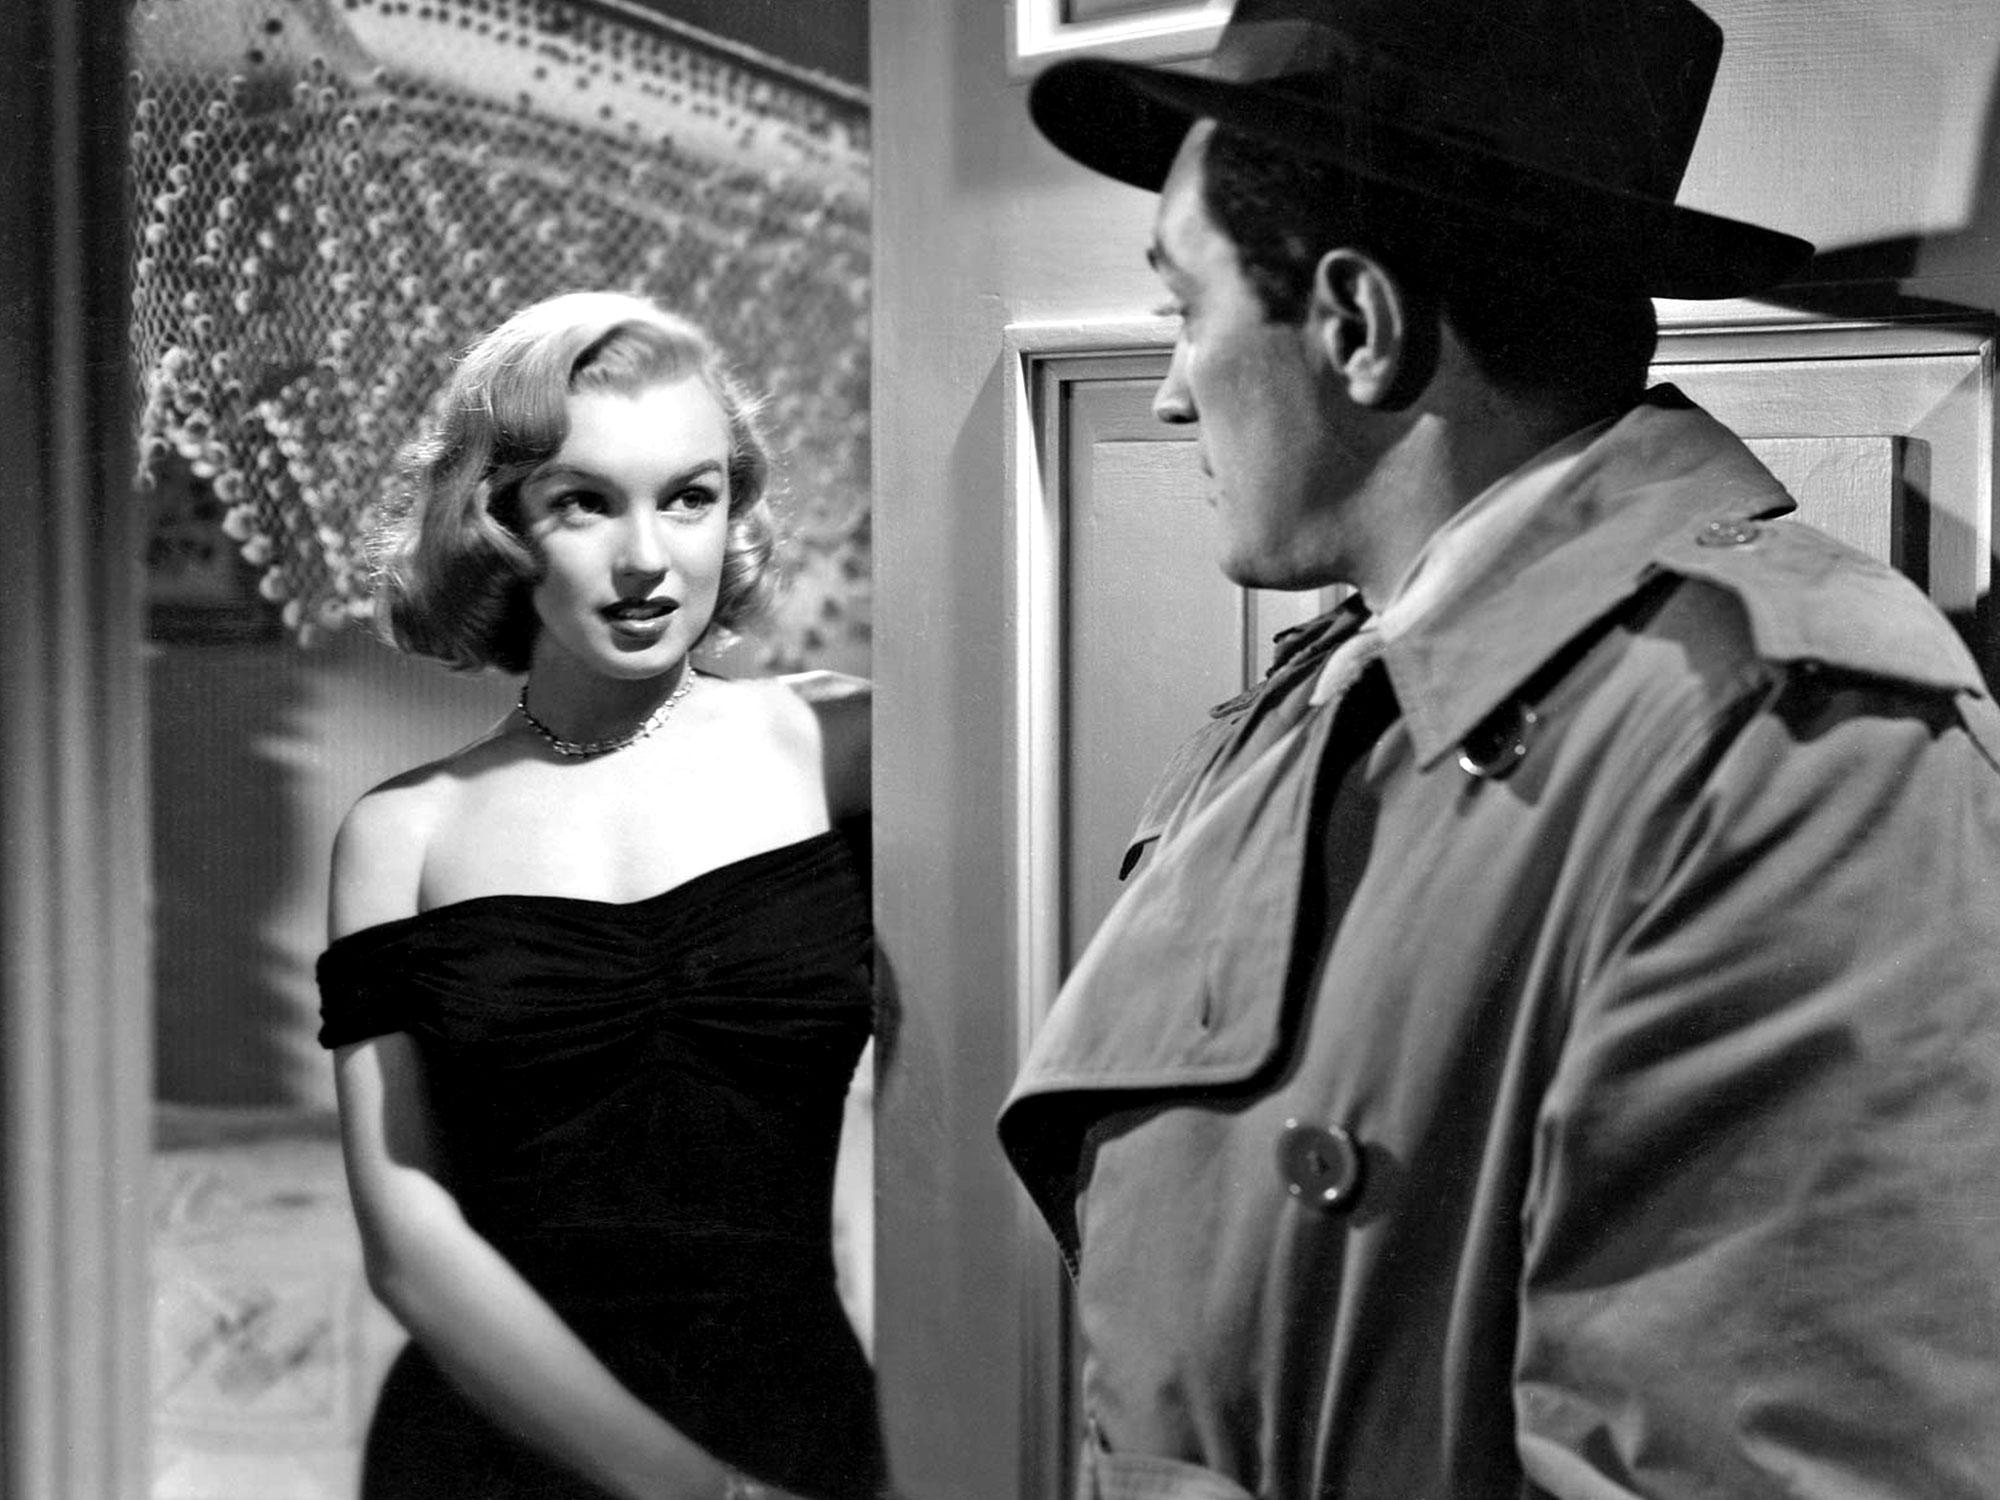 Marilyn Monroe in The Asphalt Jungle (1950)